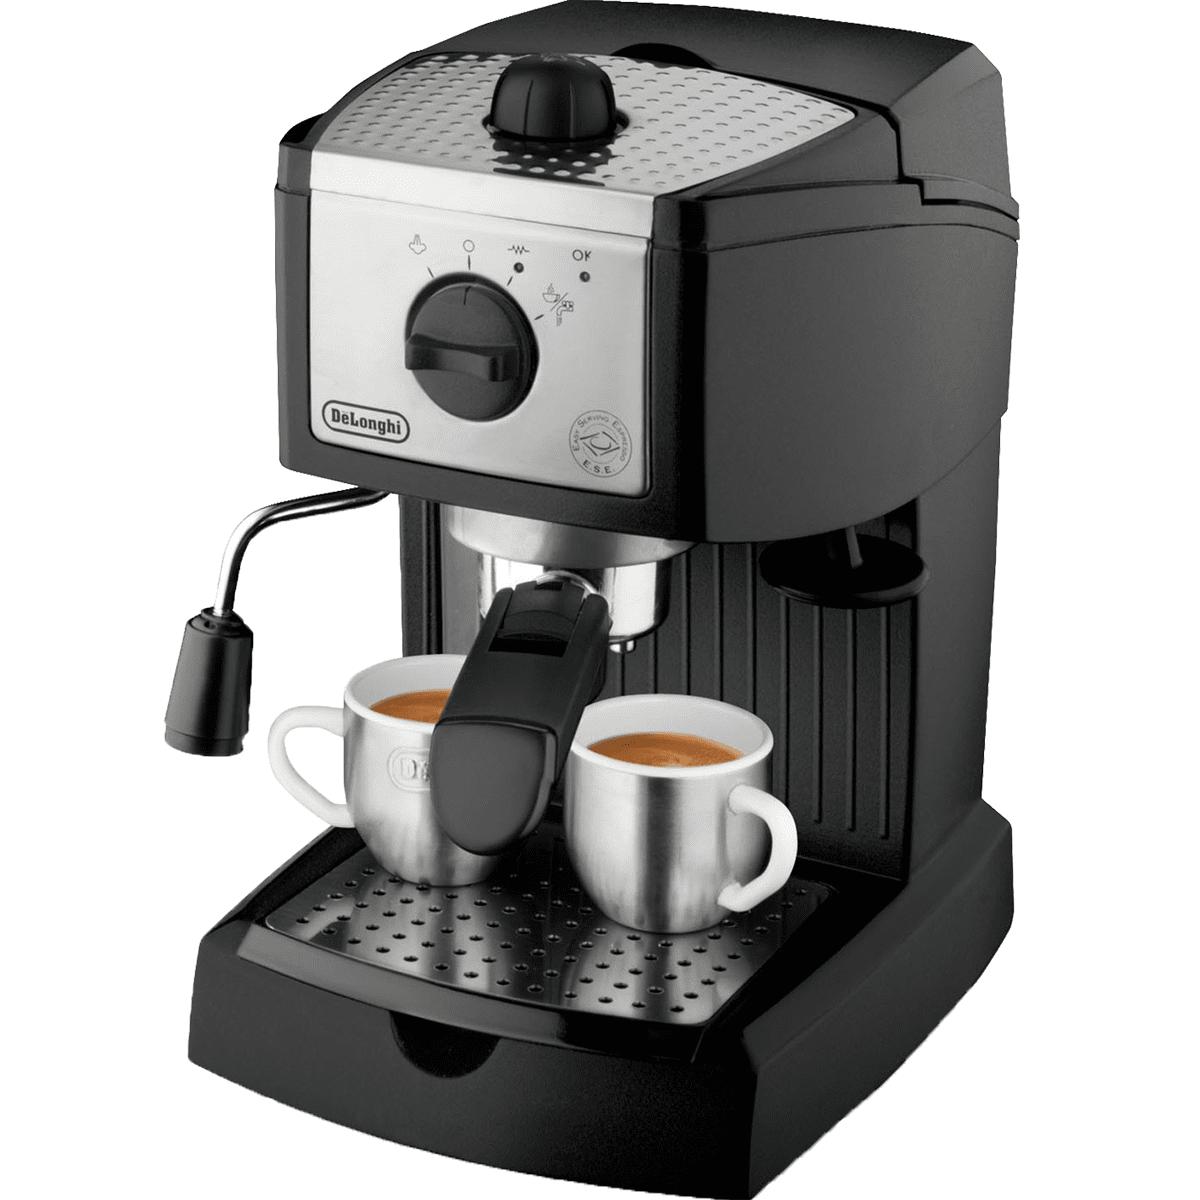 DeLonghi EC155 Manual Espresso and Cappuccino Machine